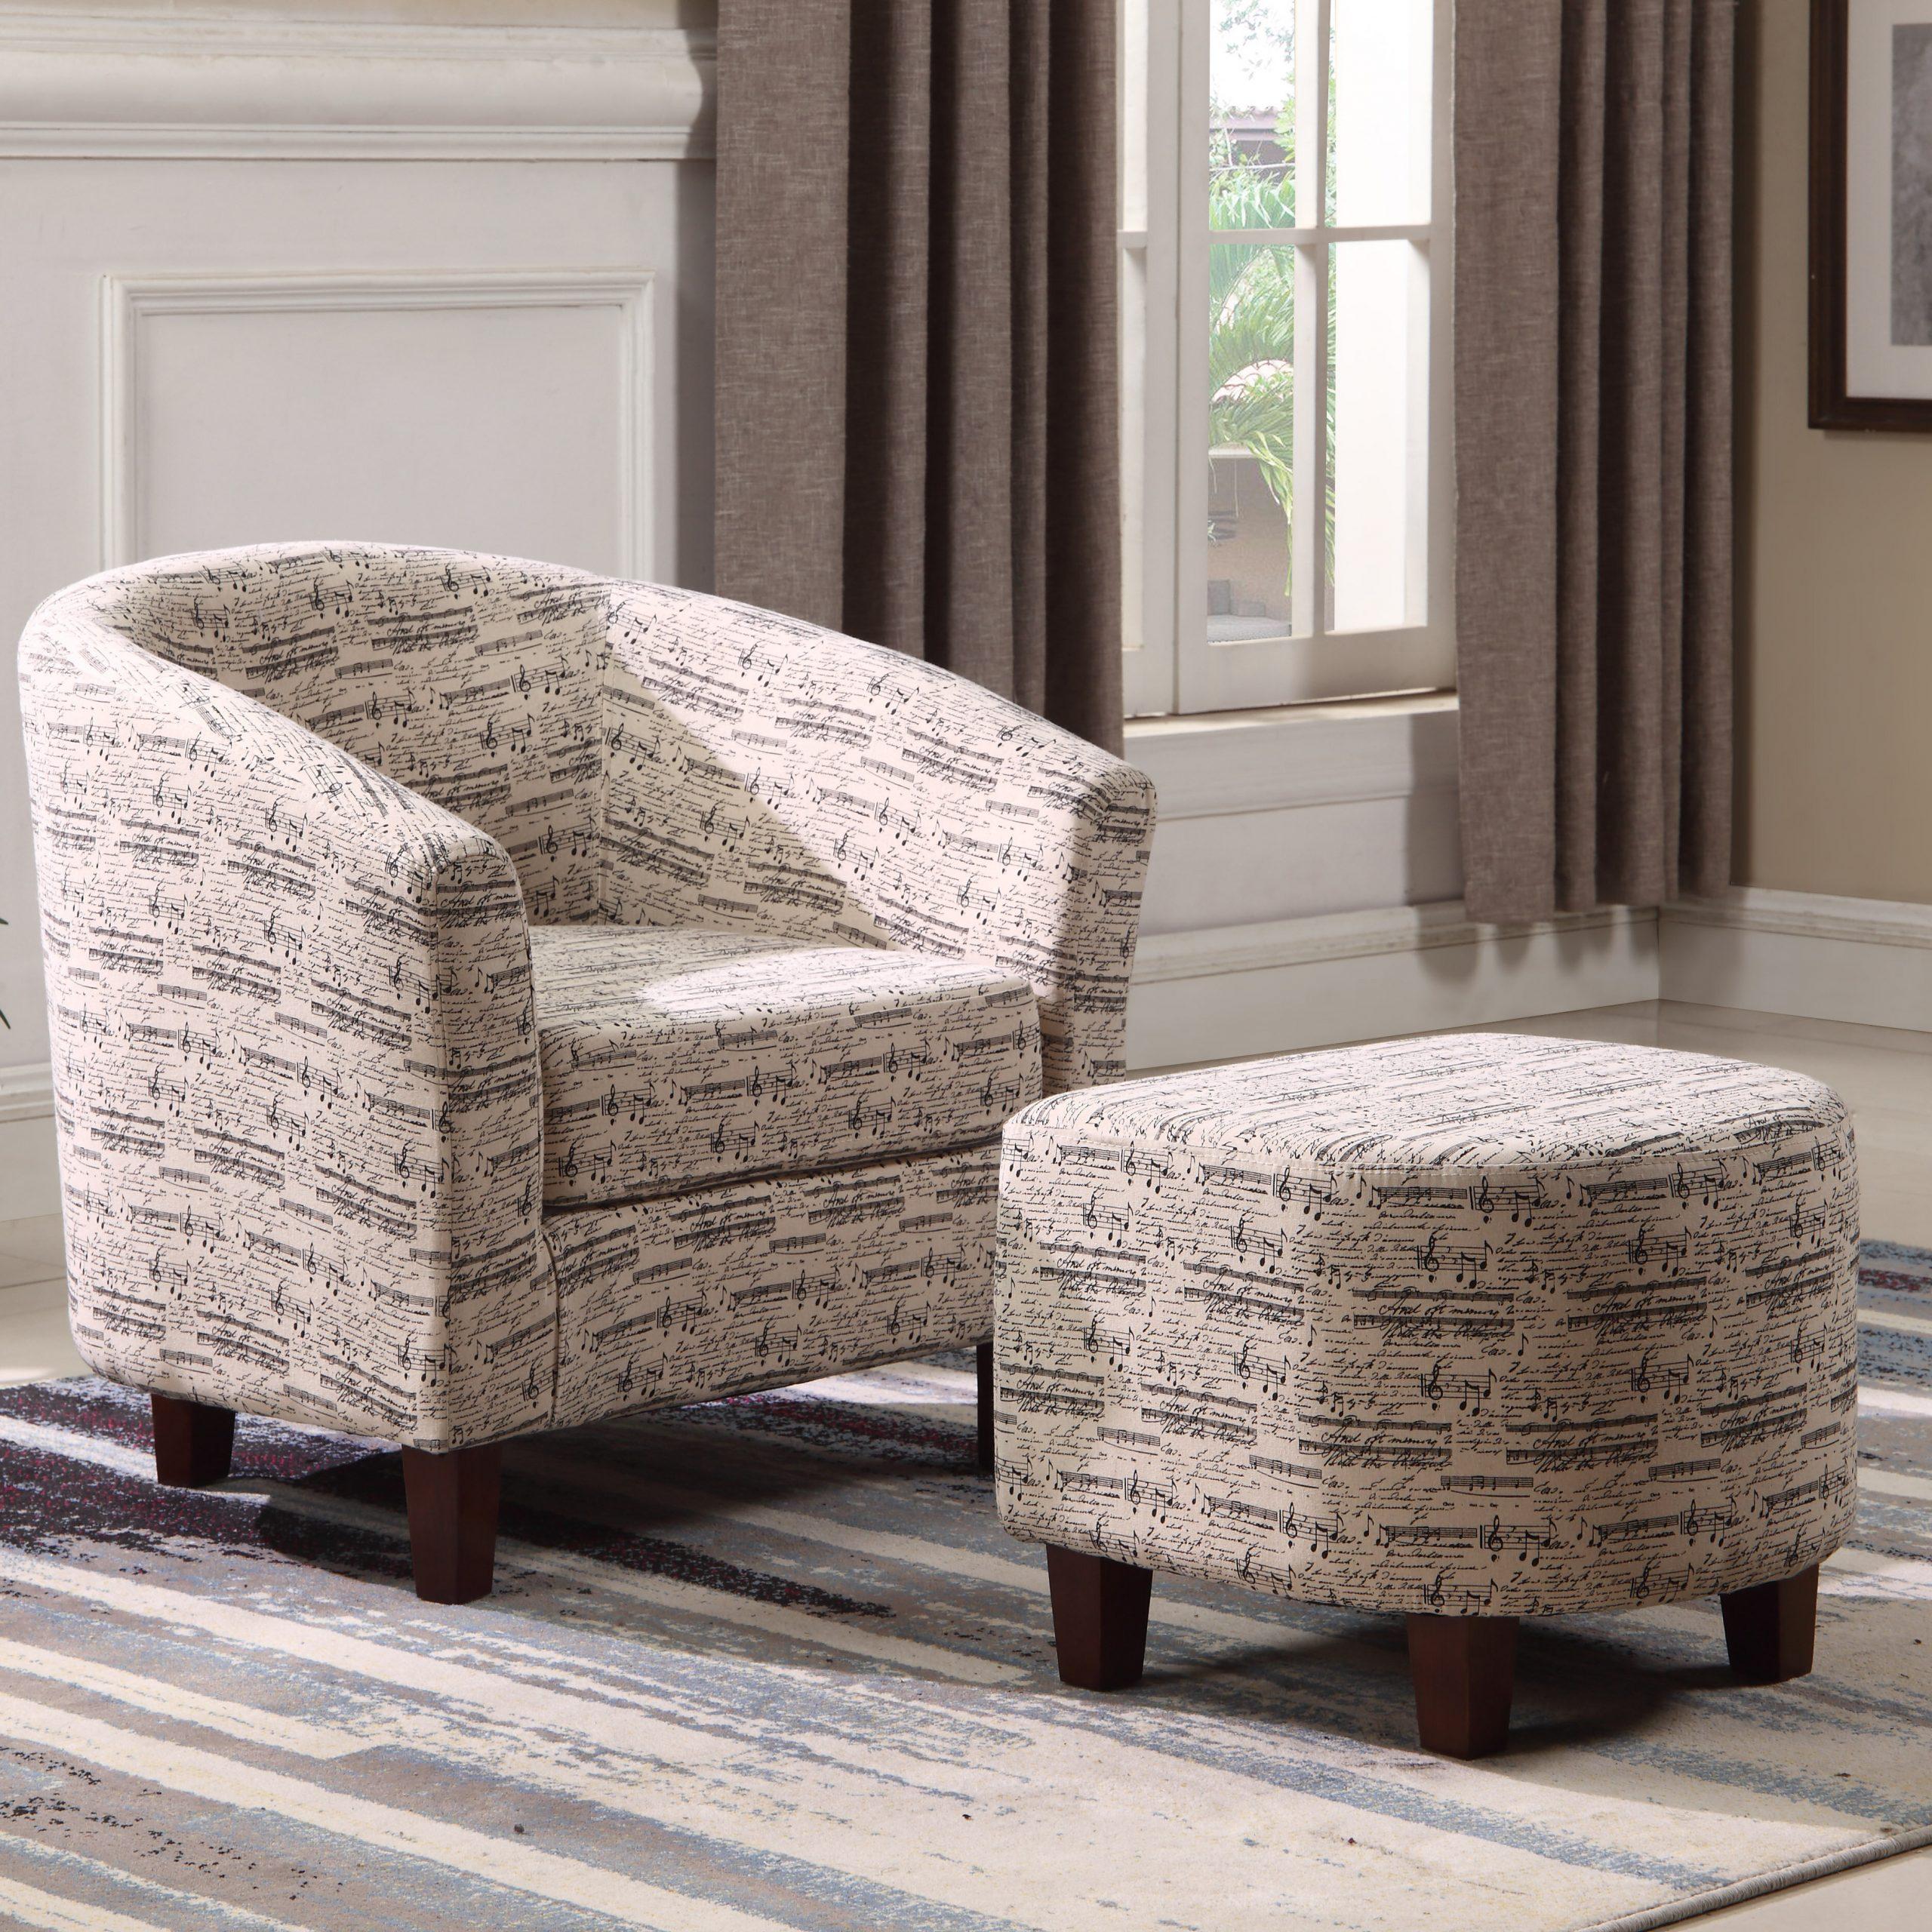 Lochlan Barrel Chair And Ottoman Regarding Lucea Faux Leather Barrel Chairs And Ottoman (View 13 of 15)